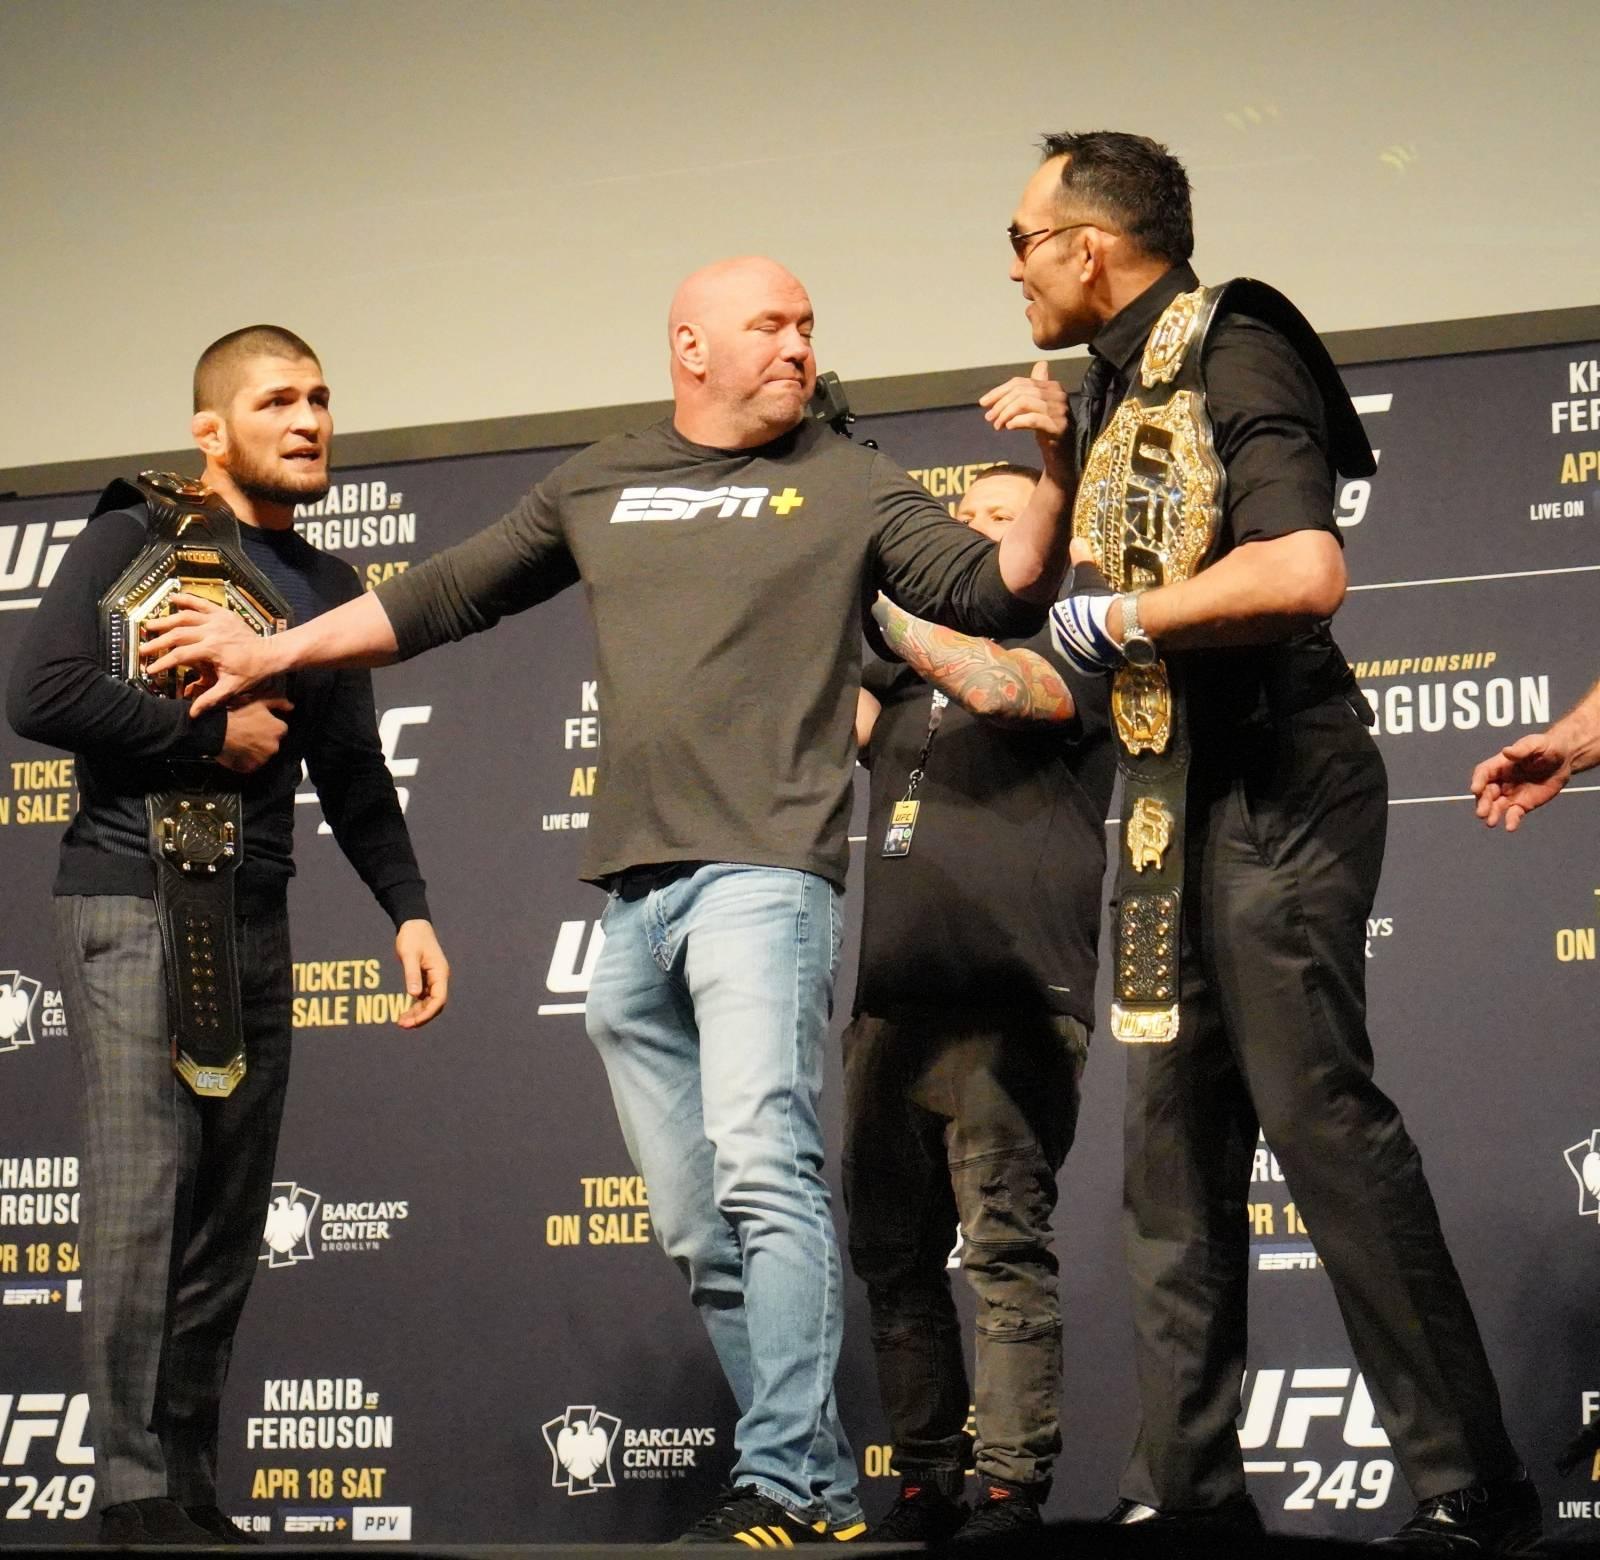 UFC 249 - Khabib Nurmagomedov press conference - NY